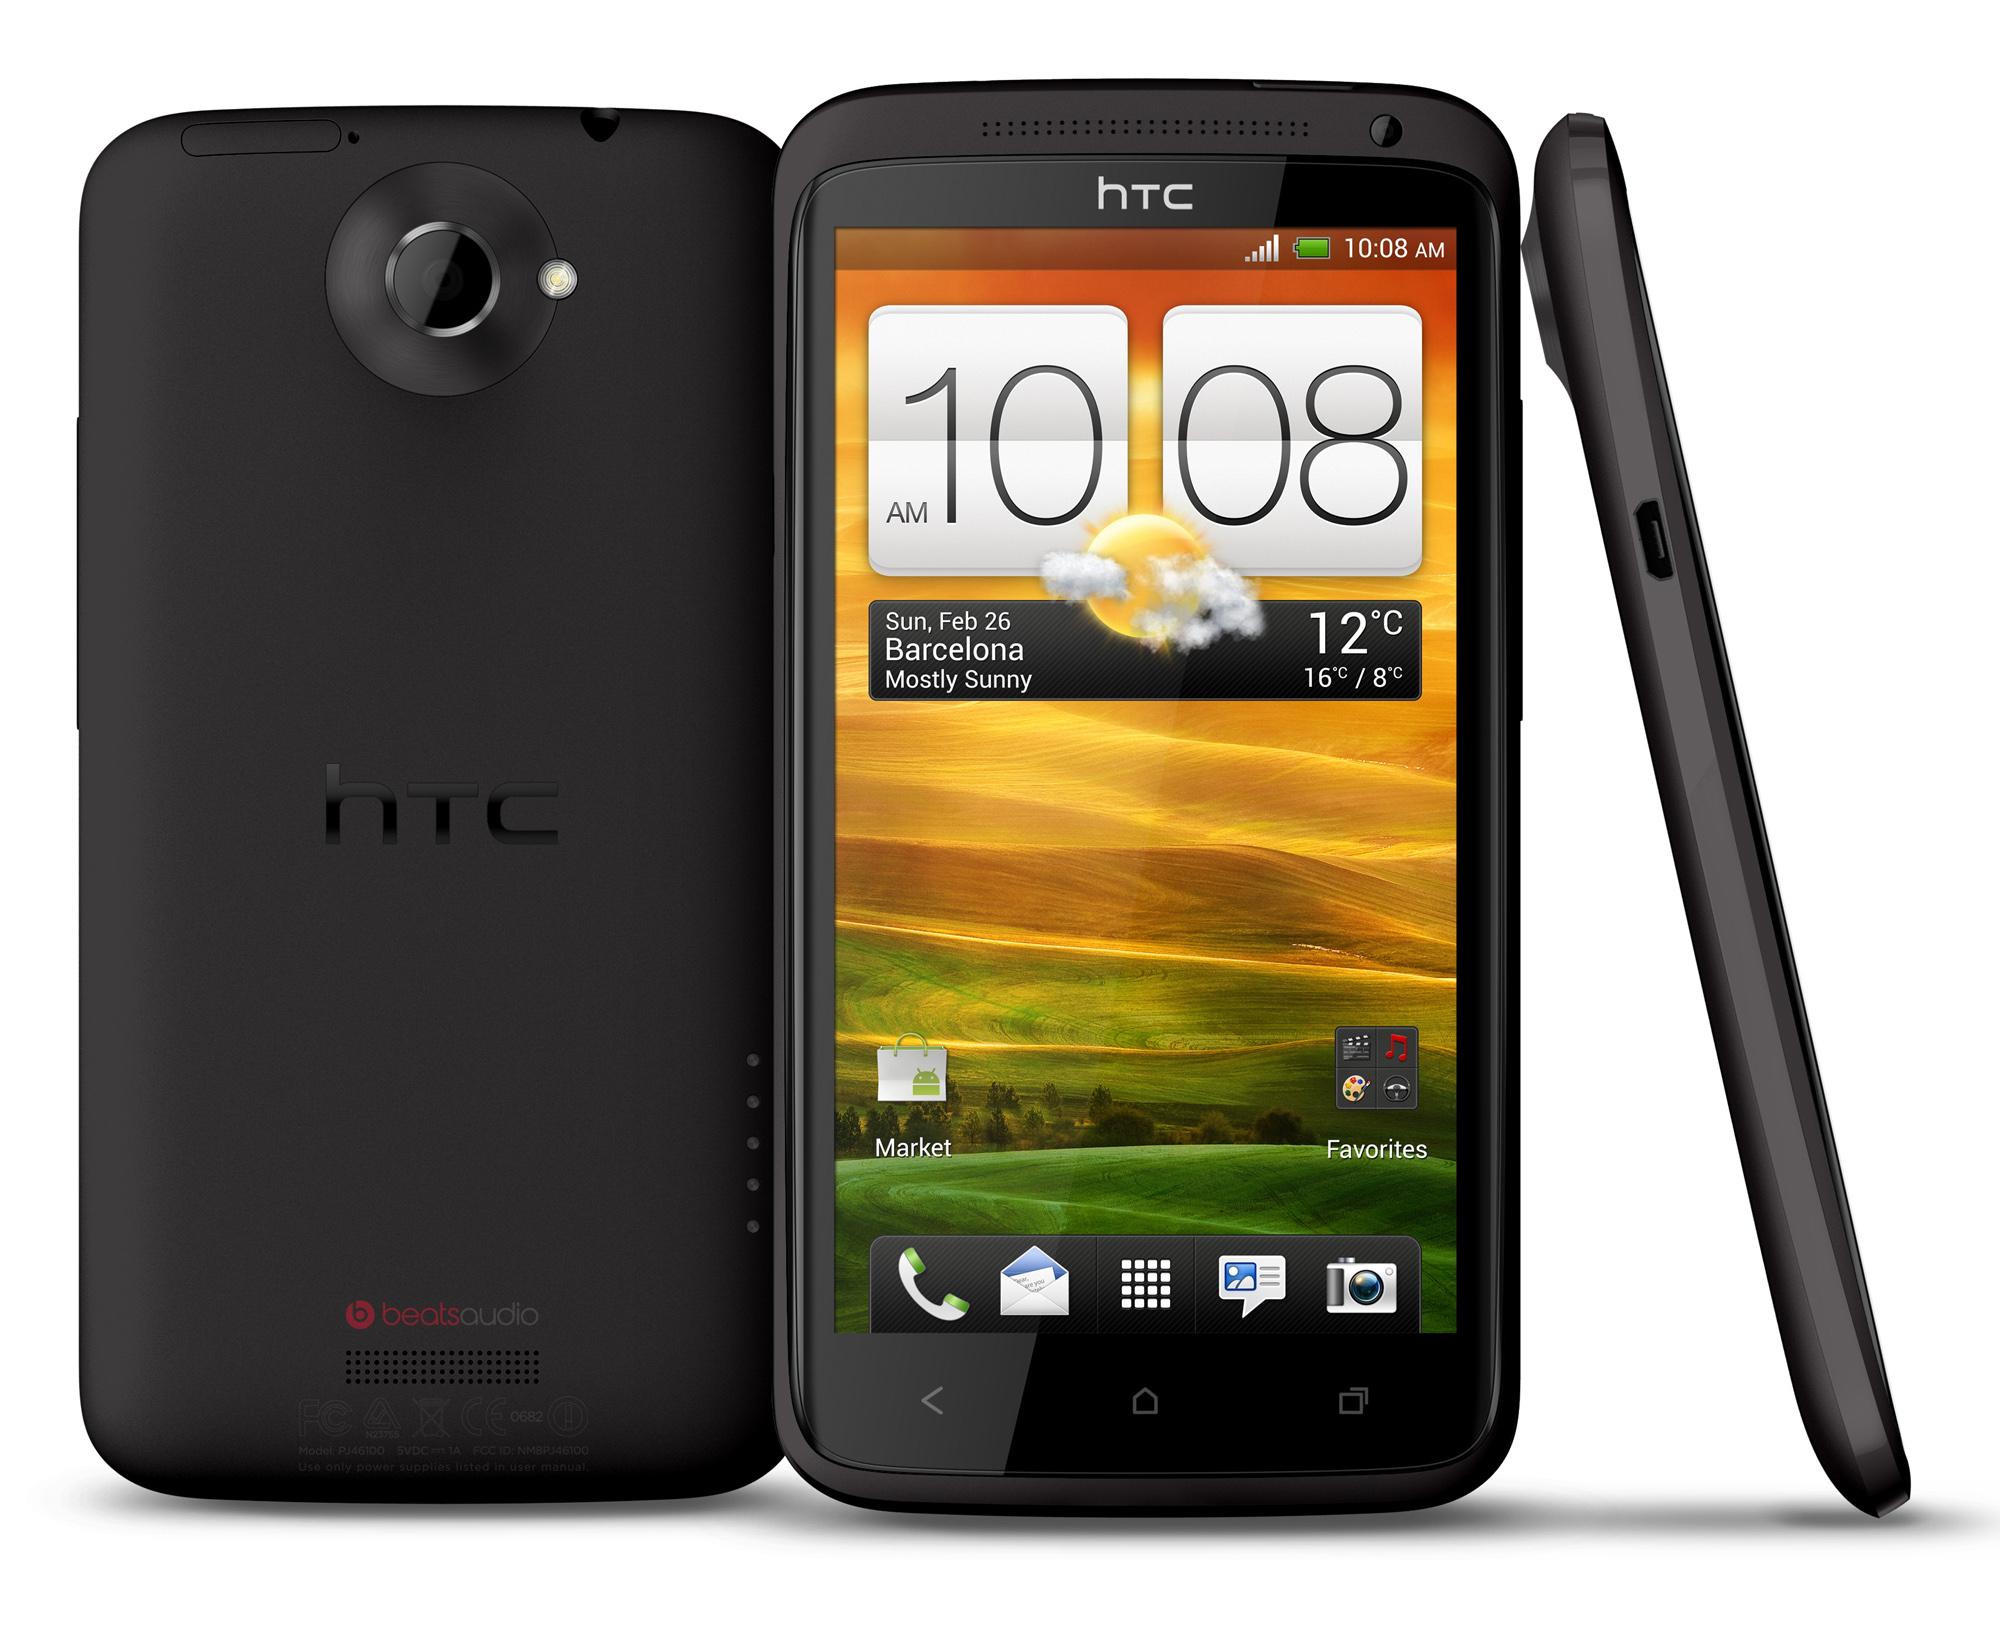 HTC-One-X.jpg